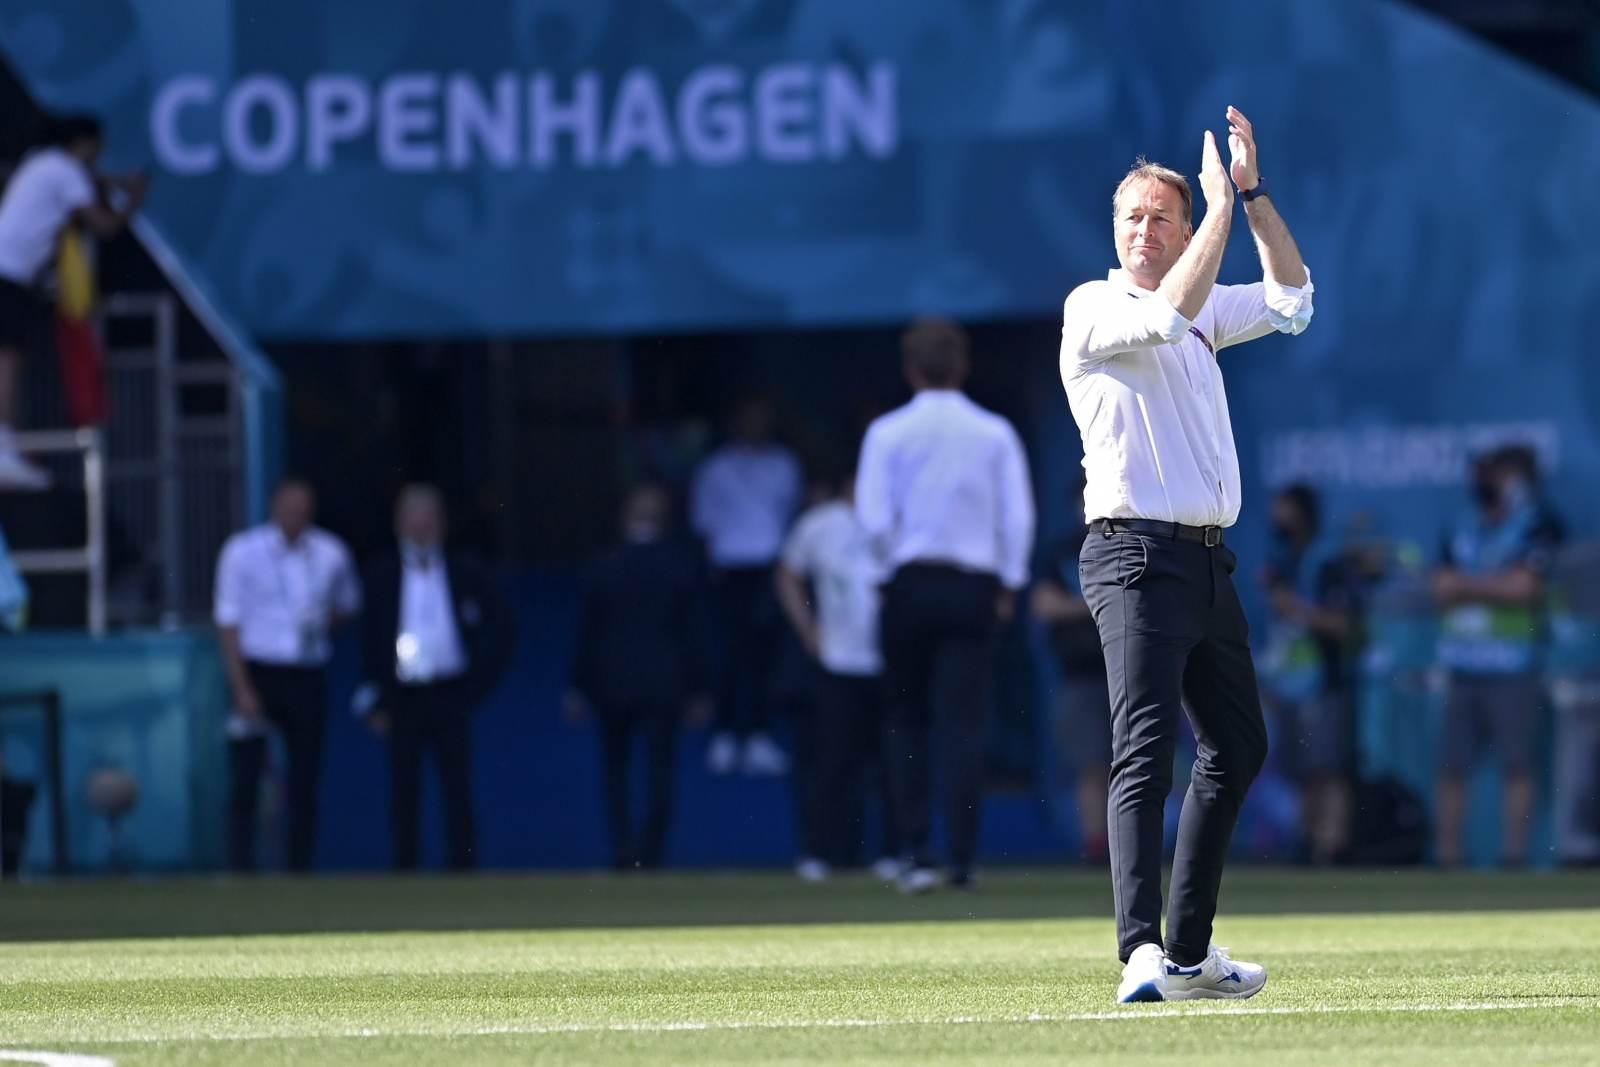 Хьюлманд: «Дания сильна командным духом»